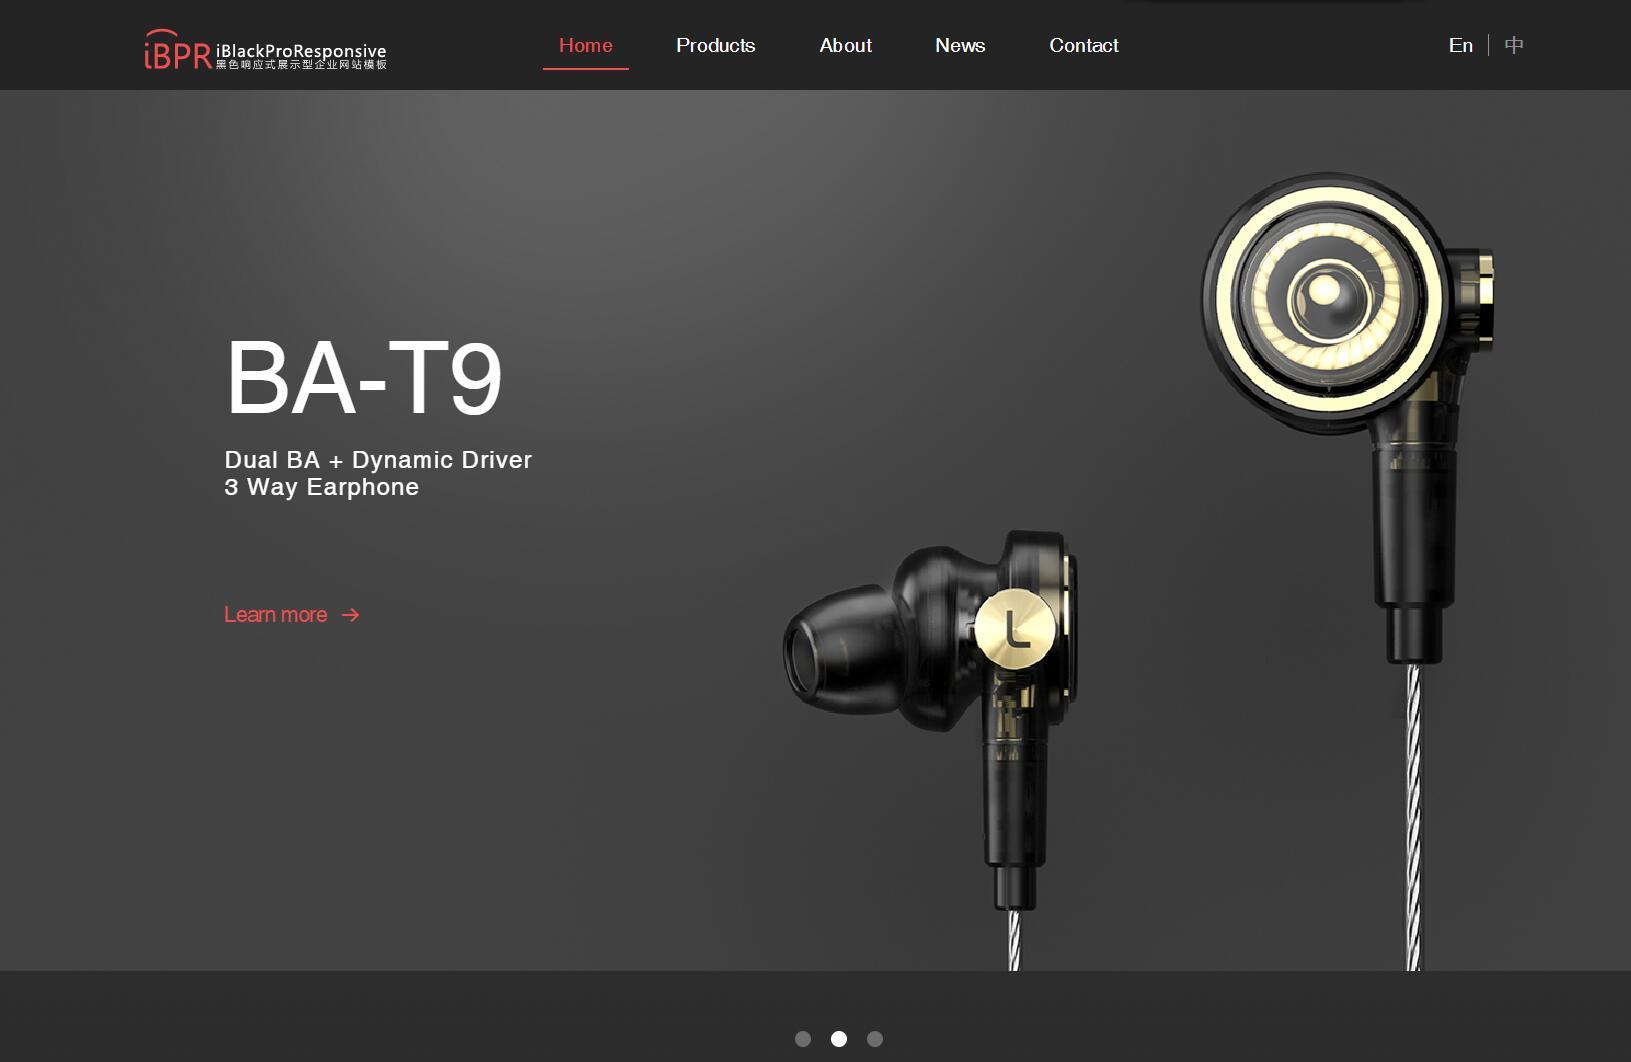 iBlackProResponsive黑色自适应Phpcms企业网站模板